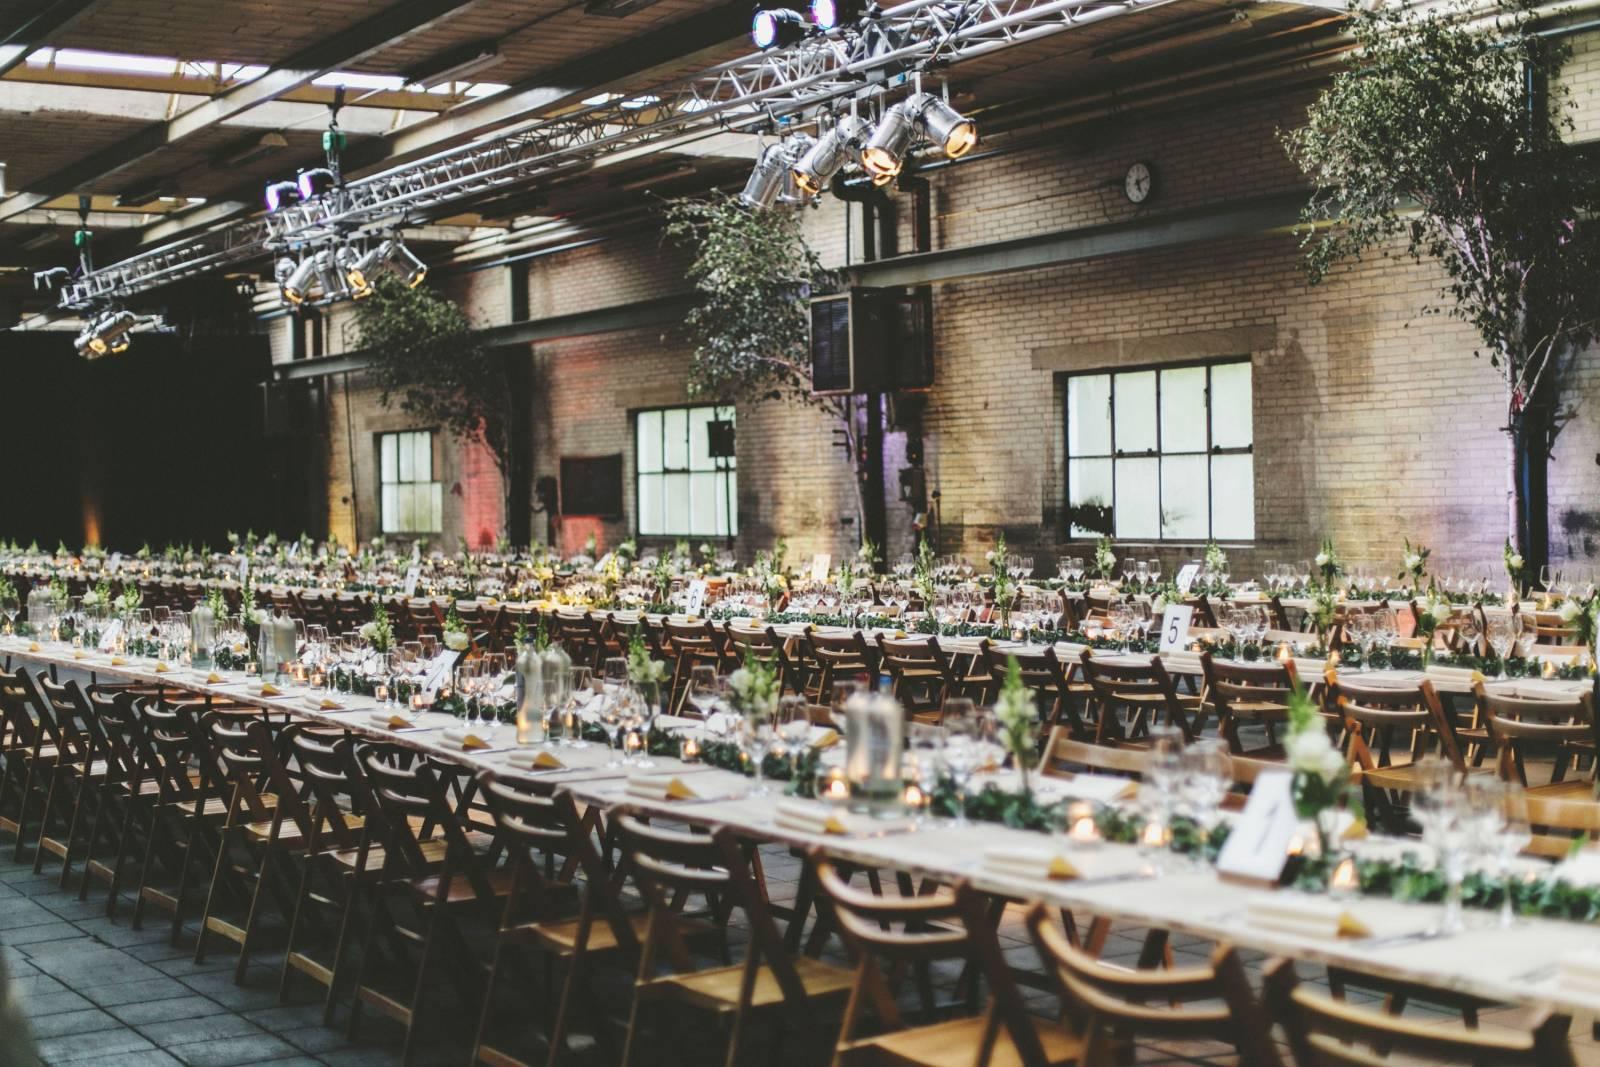 Carpe Diem Bloemen & Decoratie - House of Weddings  - 45